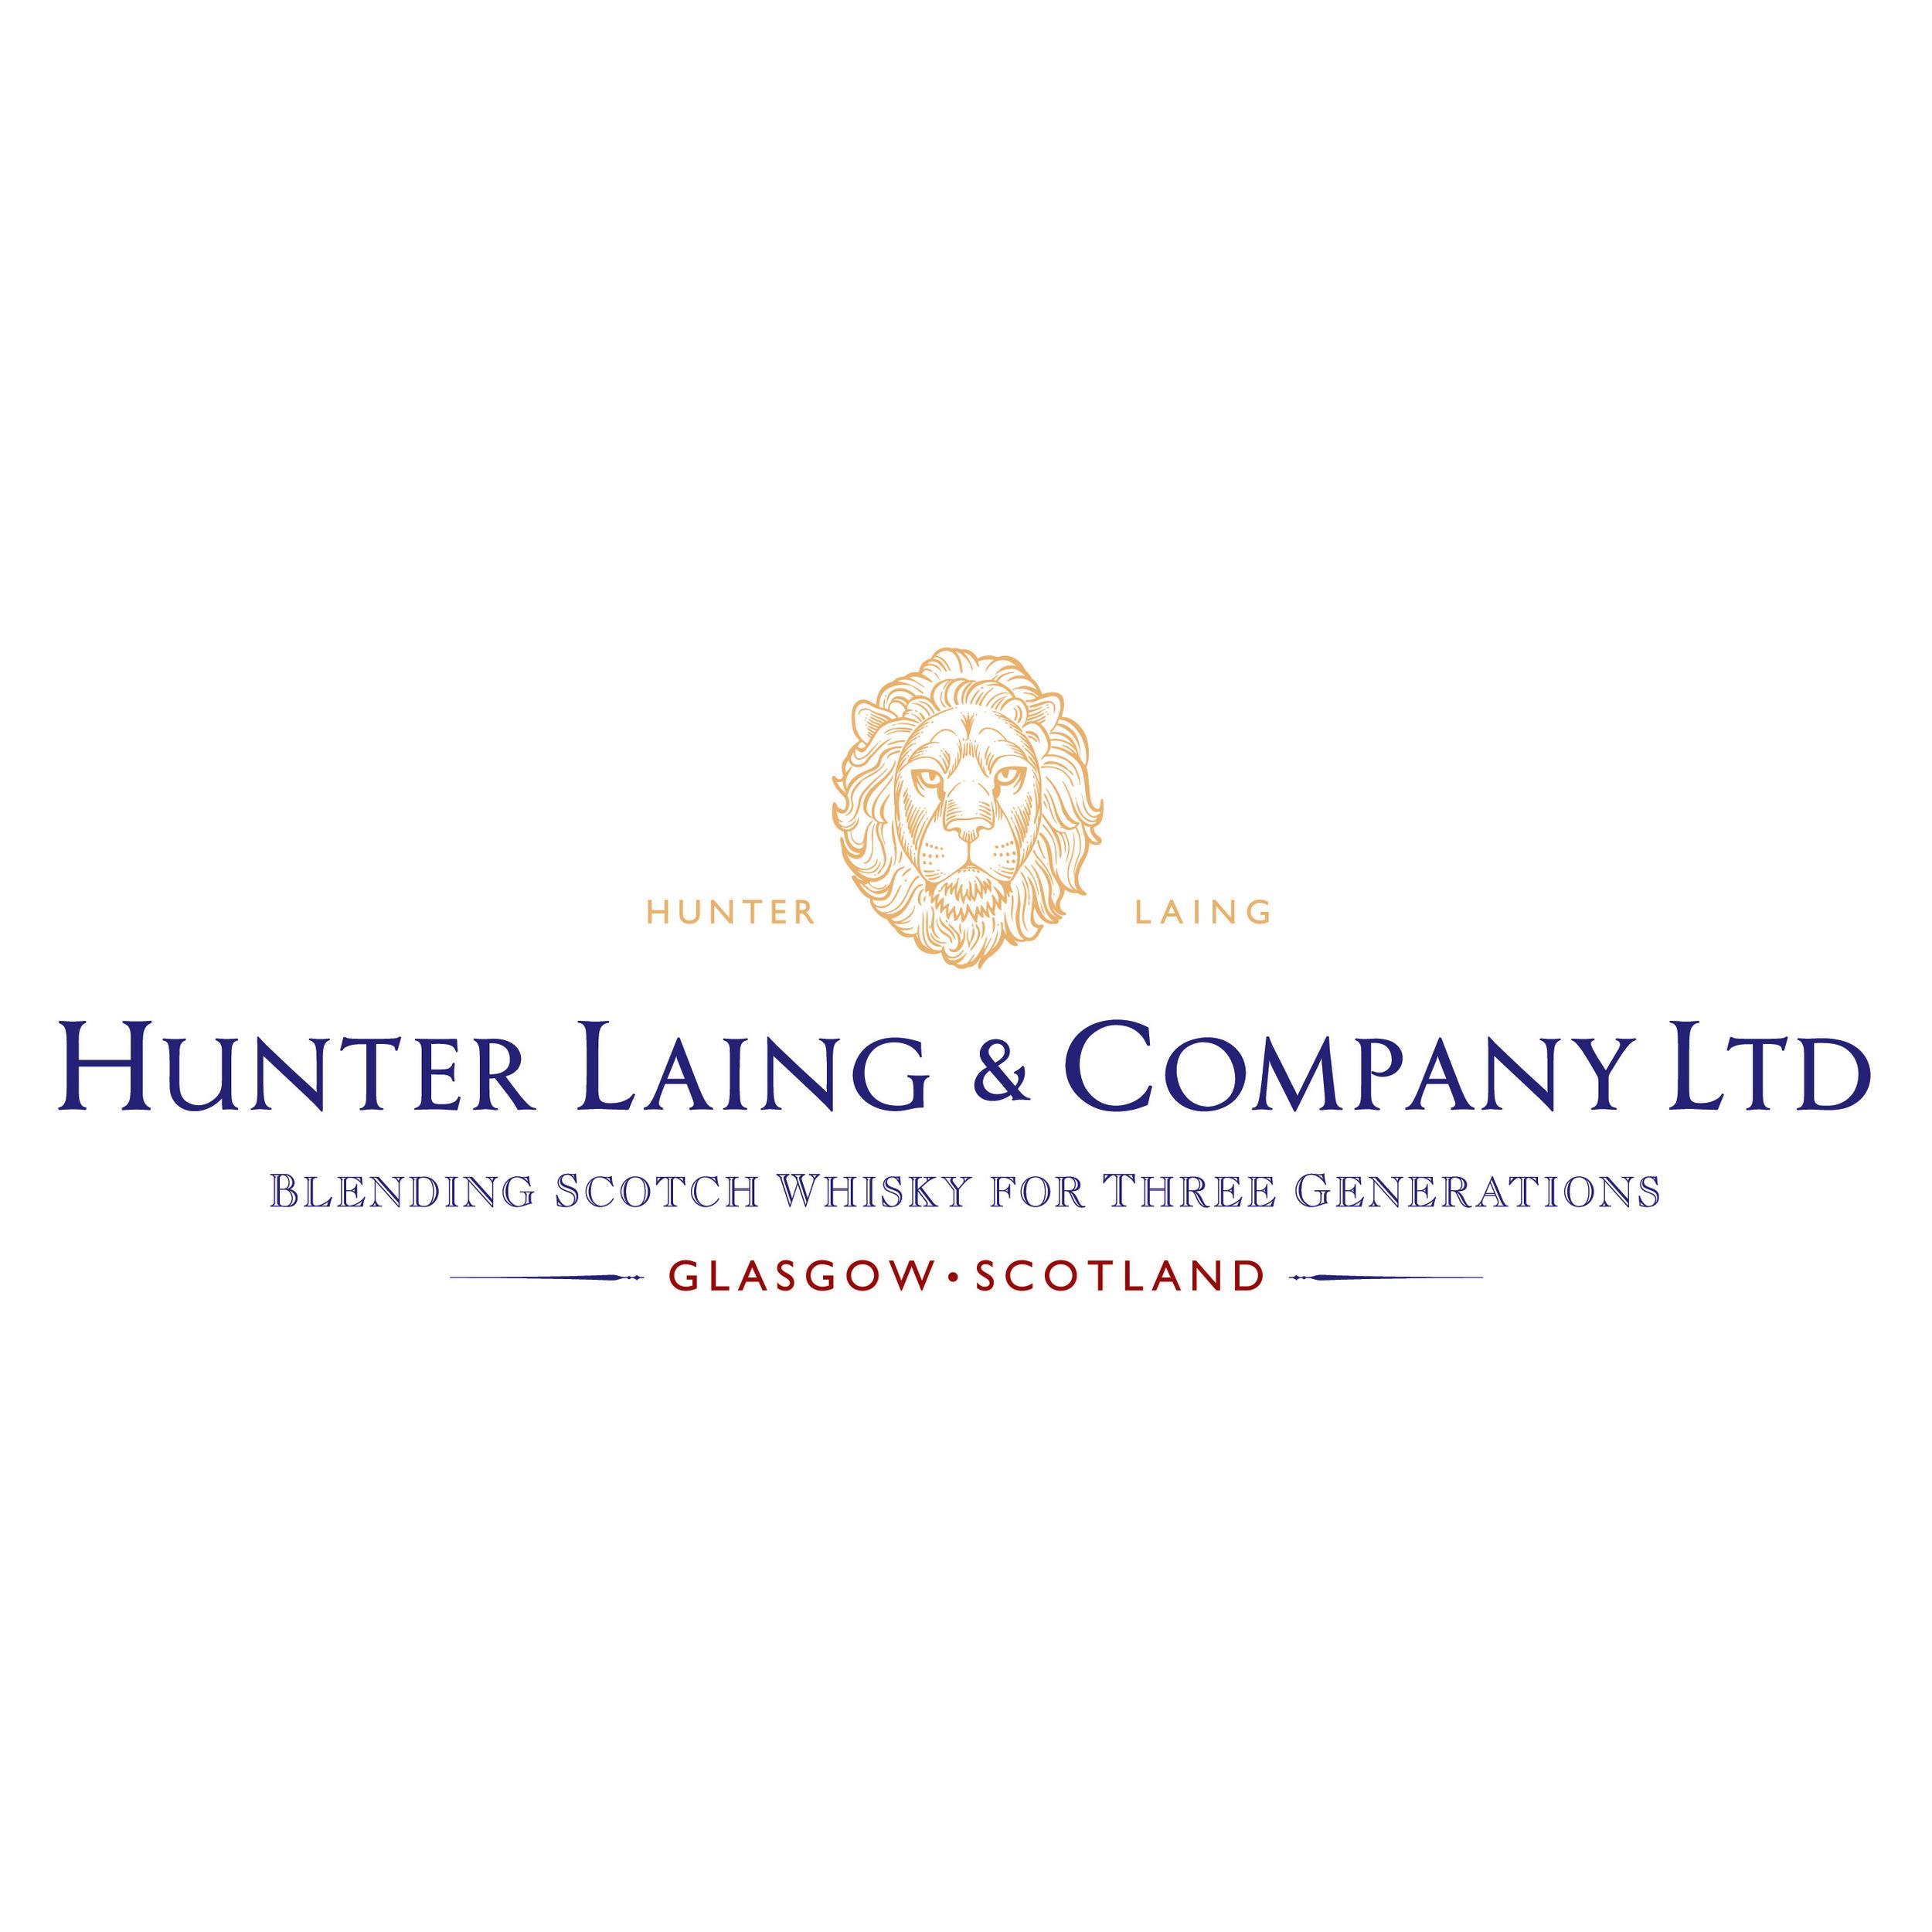 Hunter-Laing-Company-52A.jpg